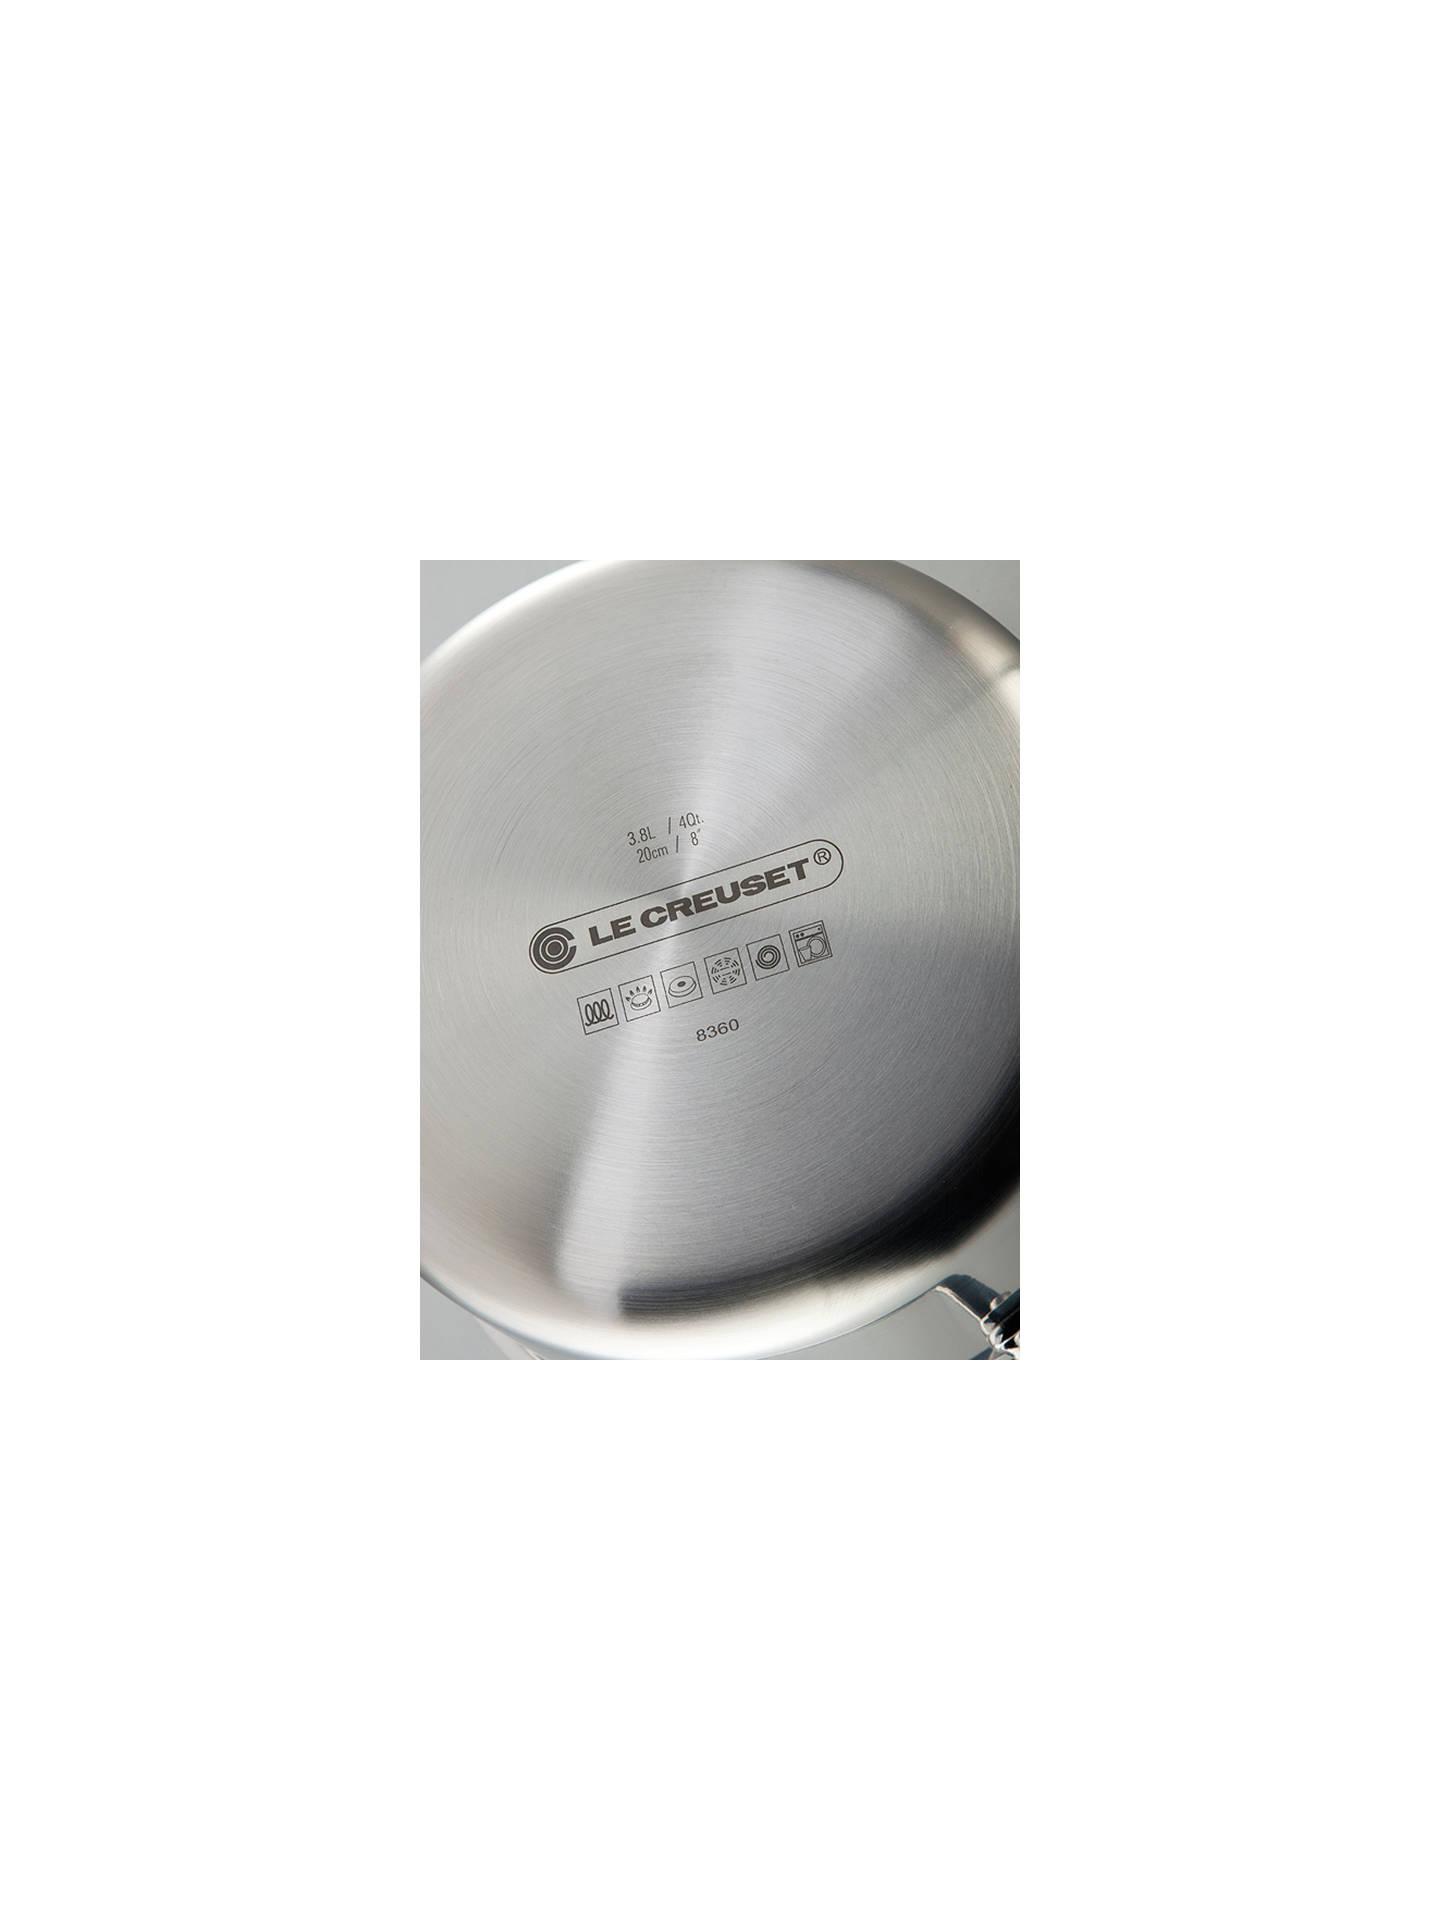 Le Creuset 3-Ply Stainless Steel Saucepan Set, 3-Piece